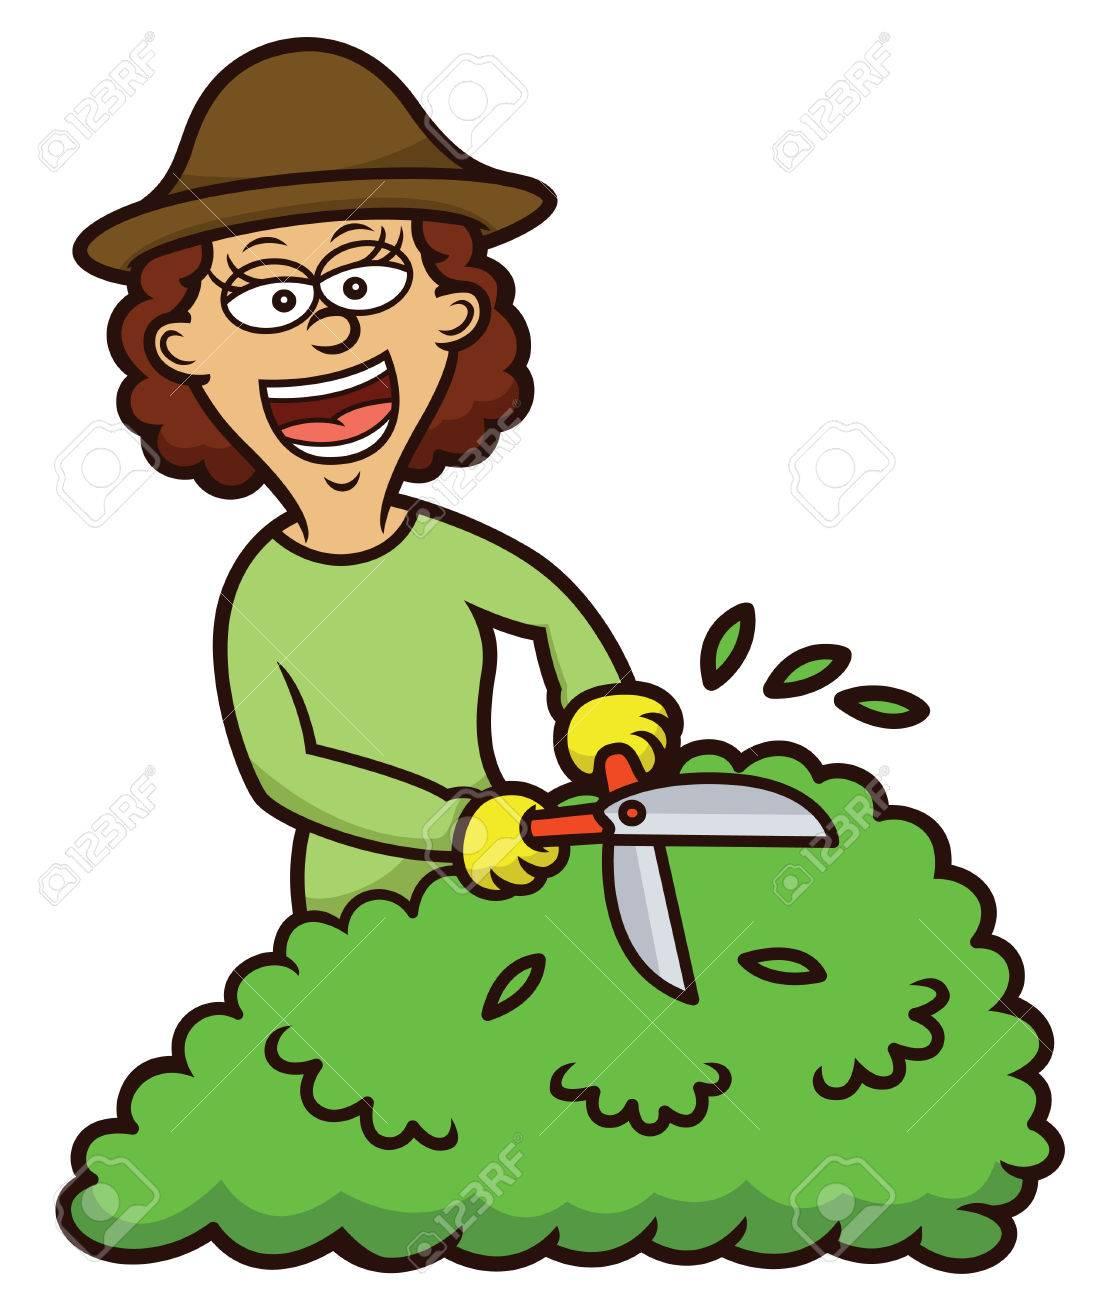 Woman Gardening Cartoon Illustration Royalty Free Cliparts Vectors And Stock Illustration Image 68544341